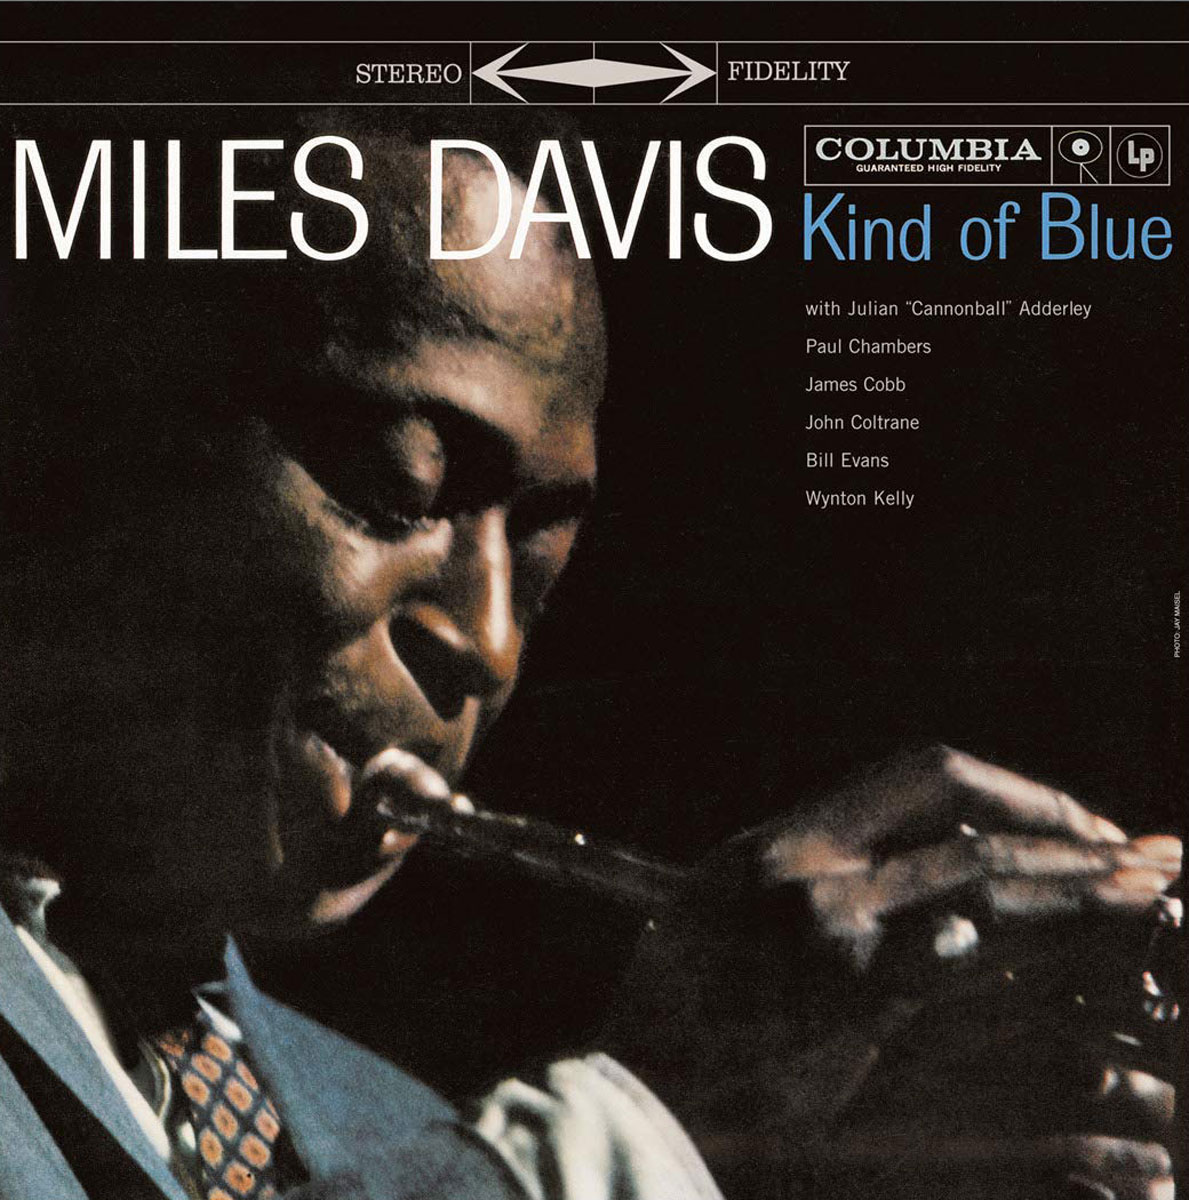 лучшая цена Майлз Дэвис,Джон Колтрейн,Уинтон Келли,Билл Эванс,Джимми Кобб Miles Davis. Kind Of Blue (LP)